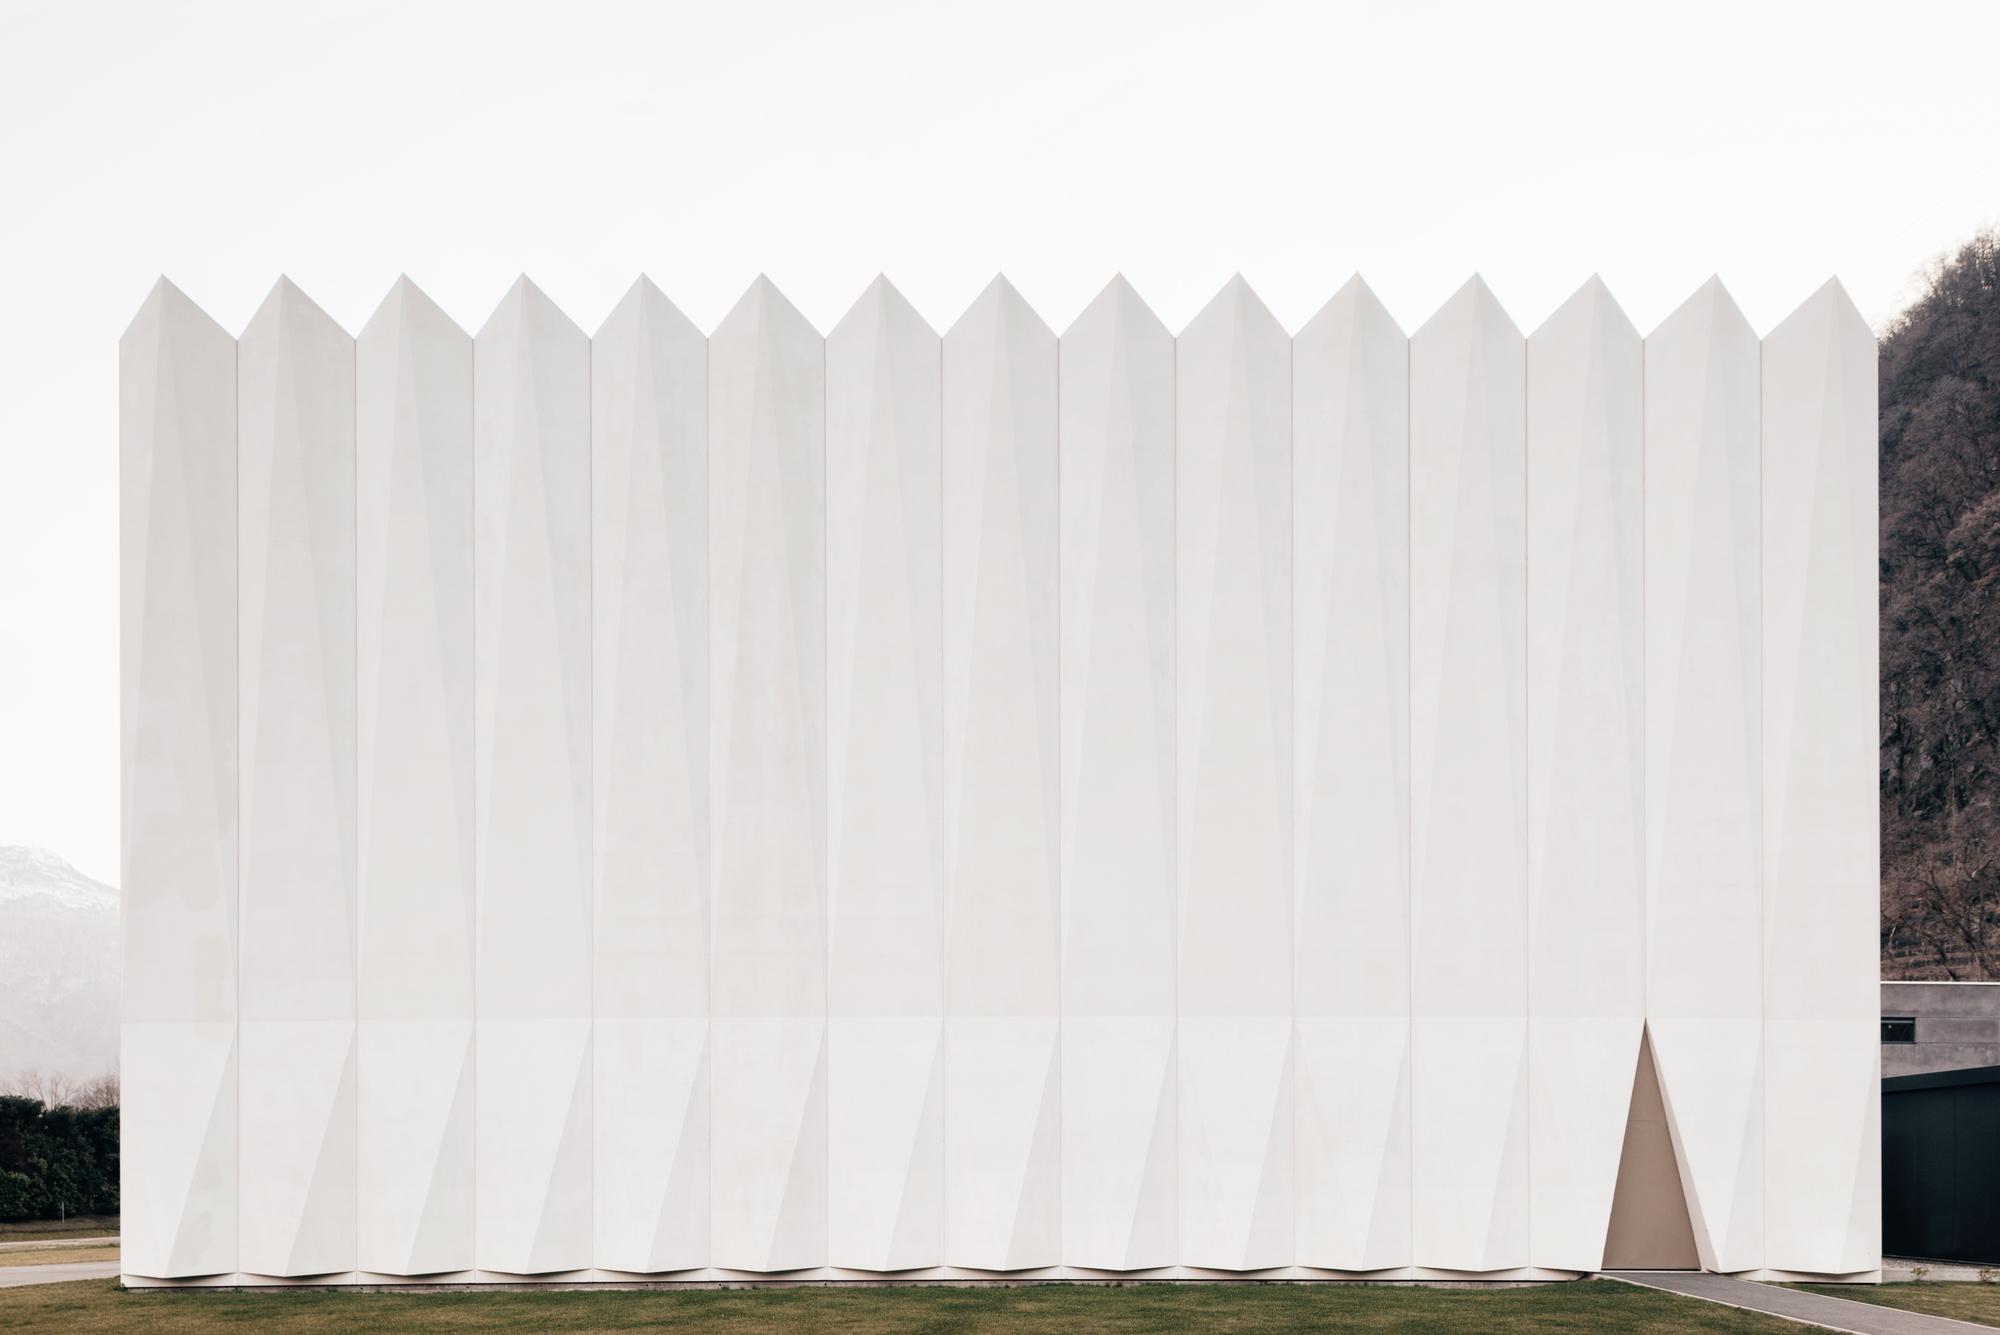 Mujeres arquitectas proyecto de Anita Bulloni